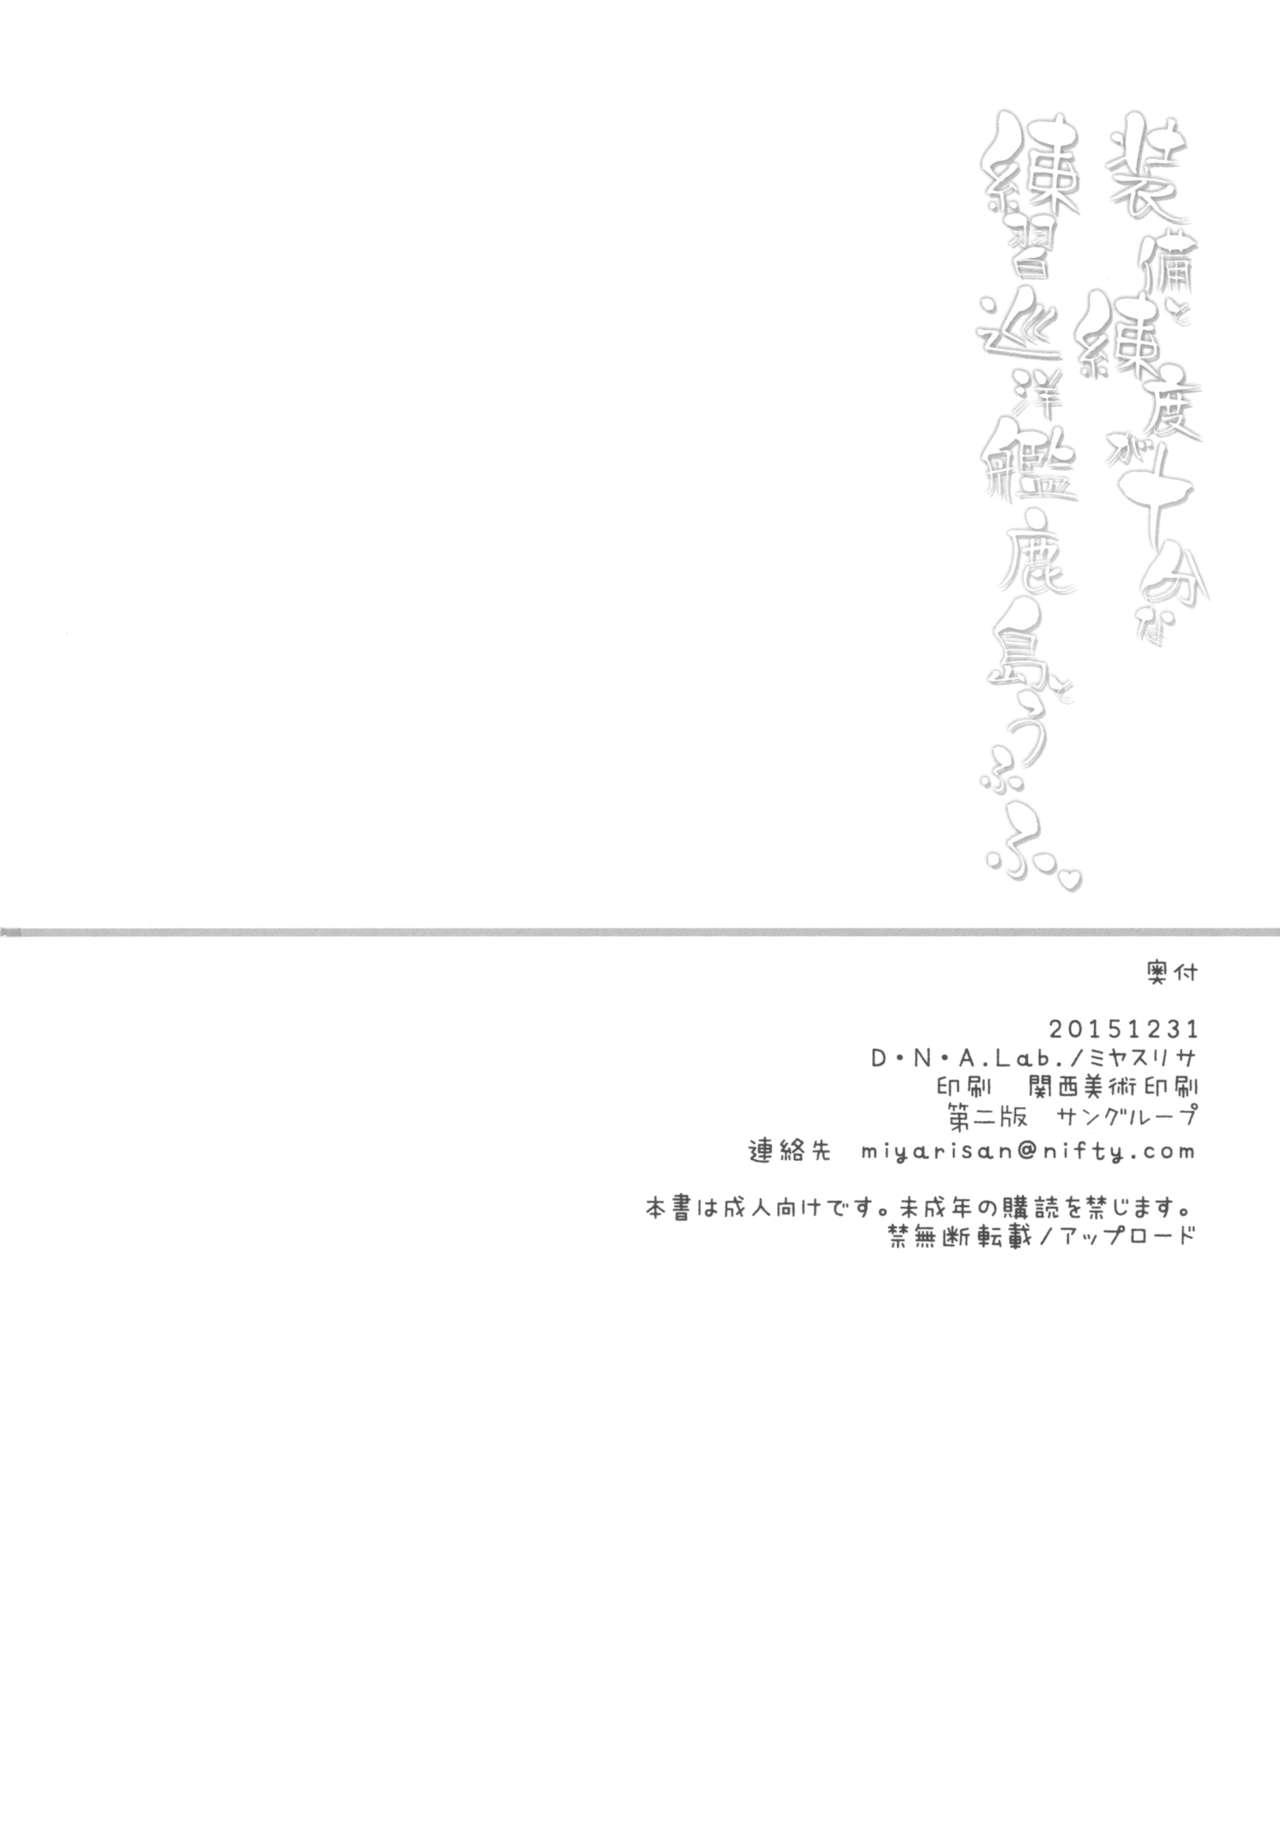 Soubi to Rendo ga Juubun na Renshuu Junyoukan Kashima to Ufufu 24